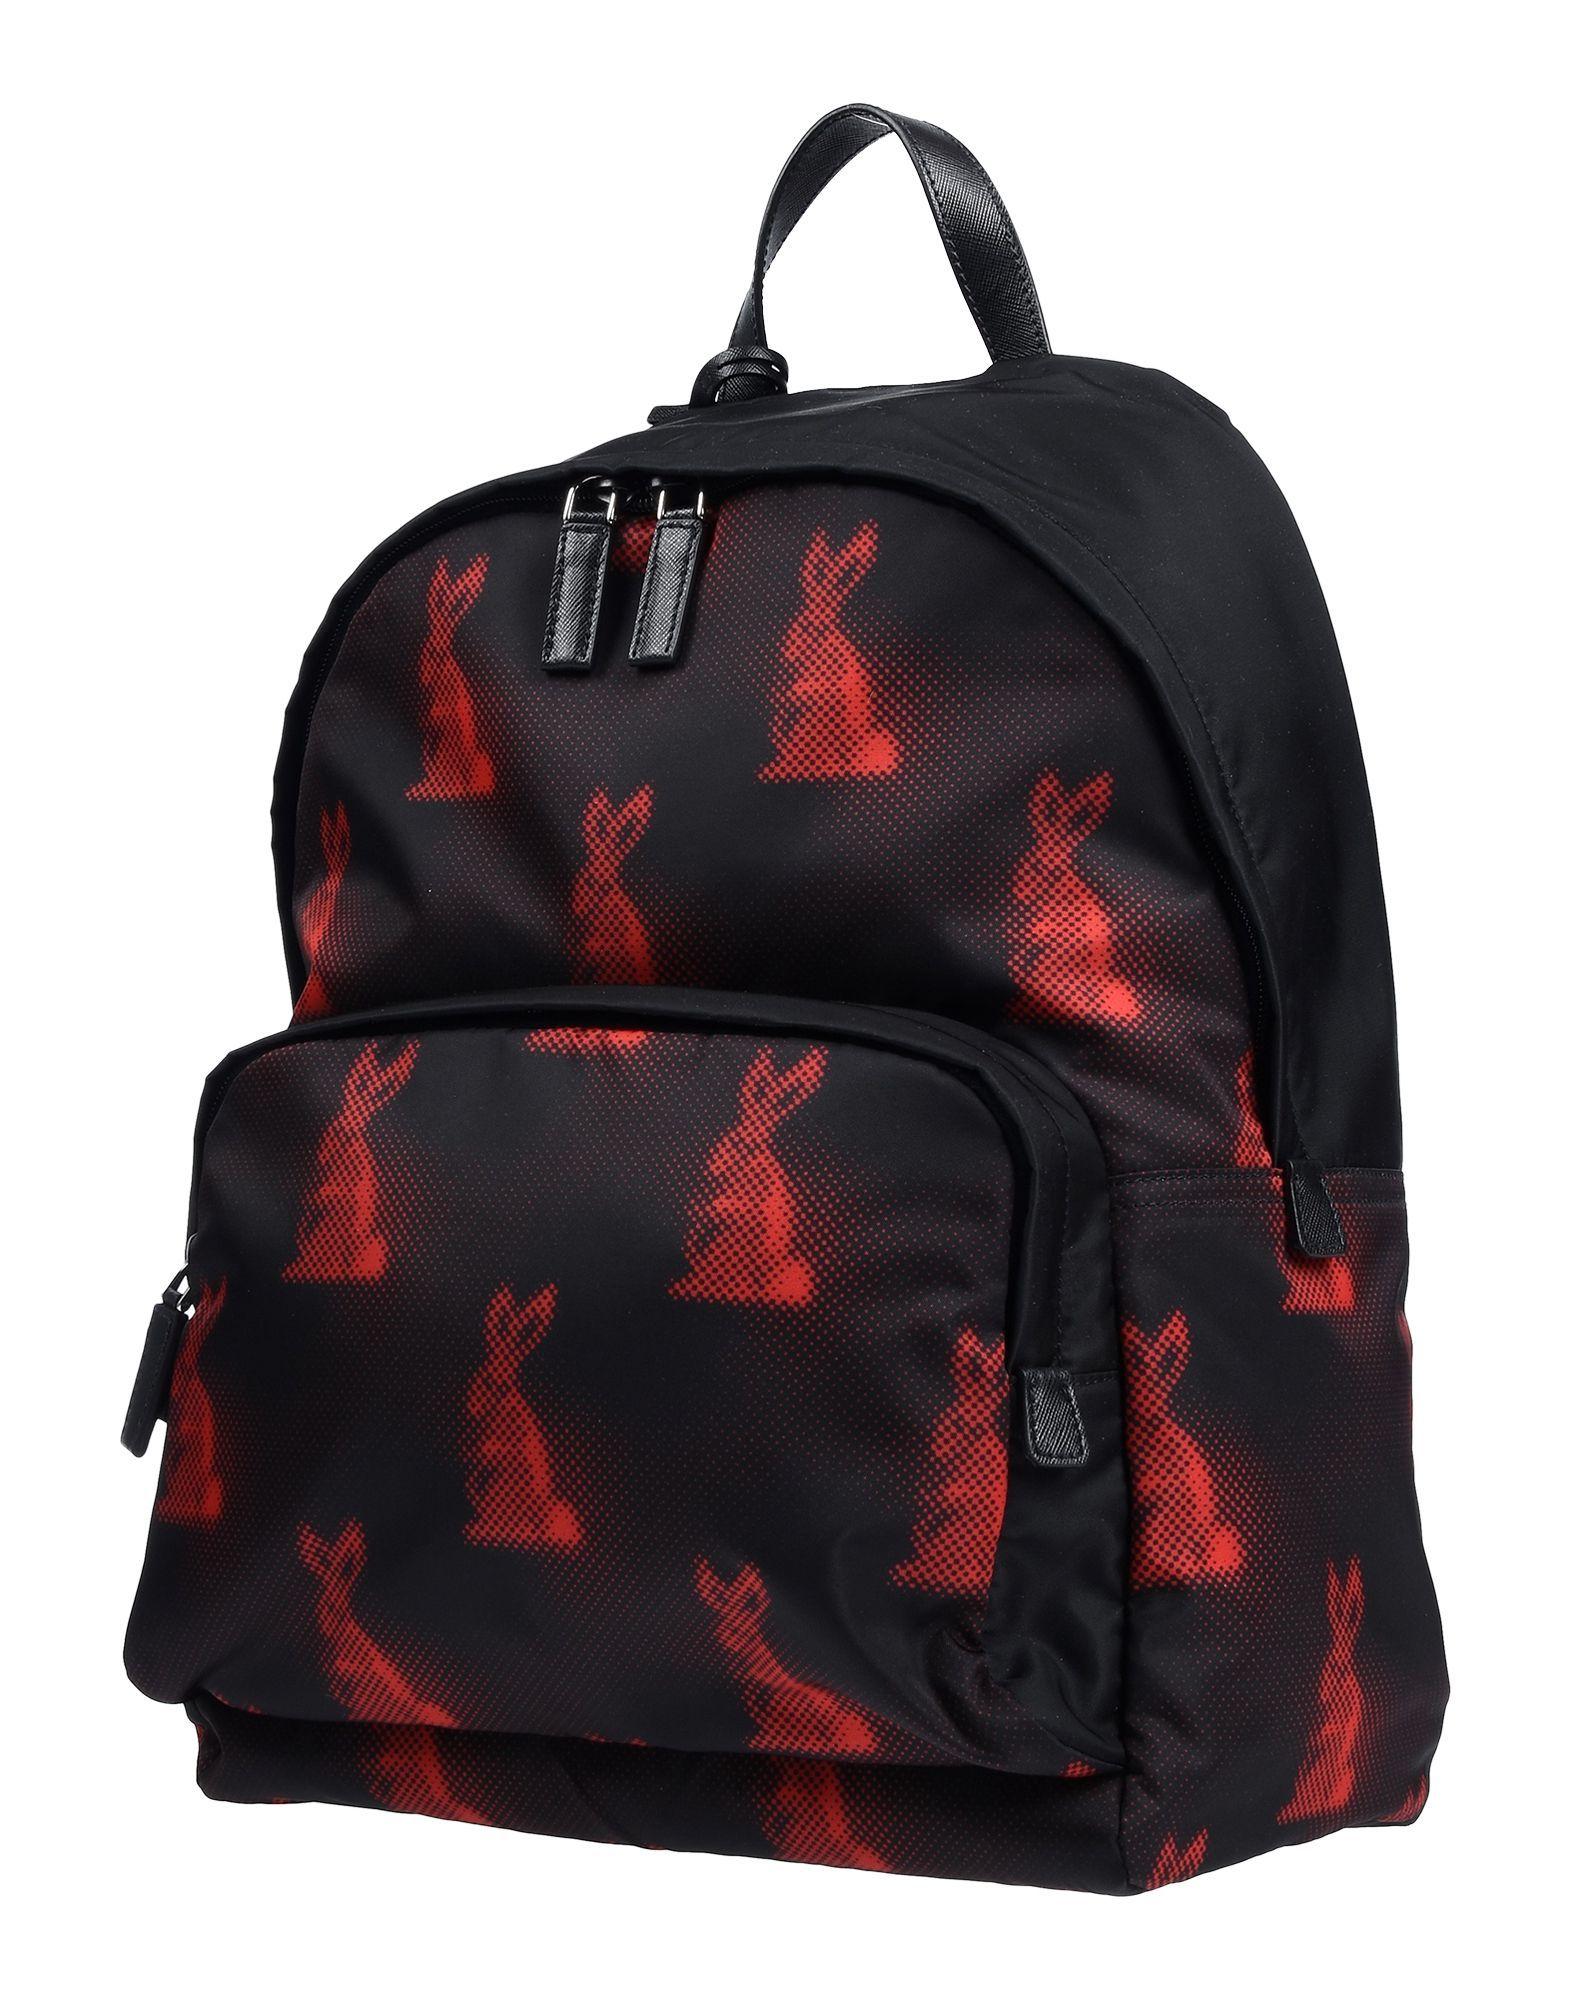 617fc6cb99 PRADA BACKPACKS & FANNY PACKS. #prada #bags #leather #backpacks ...